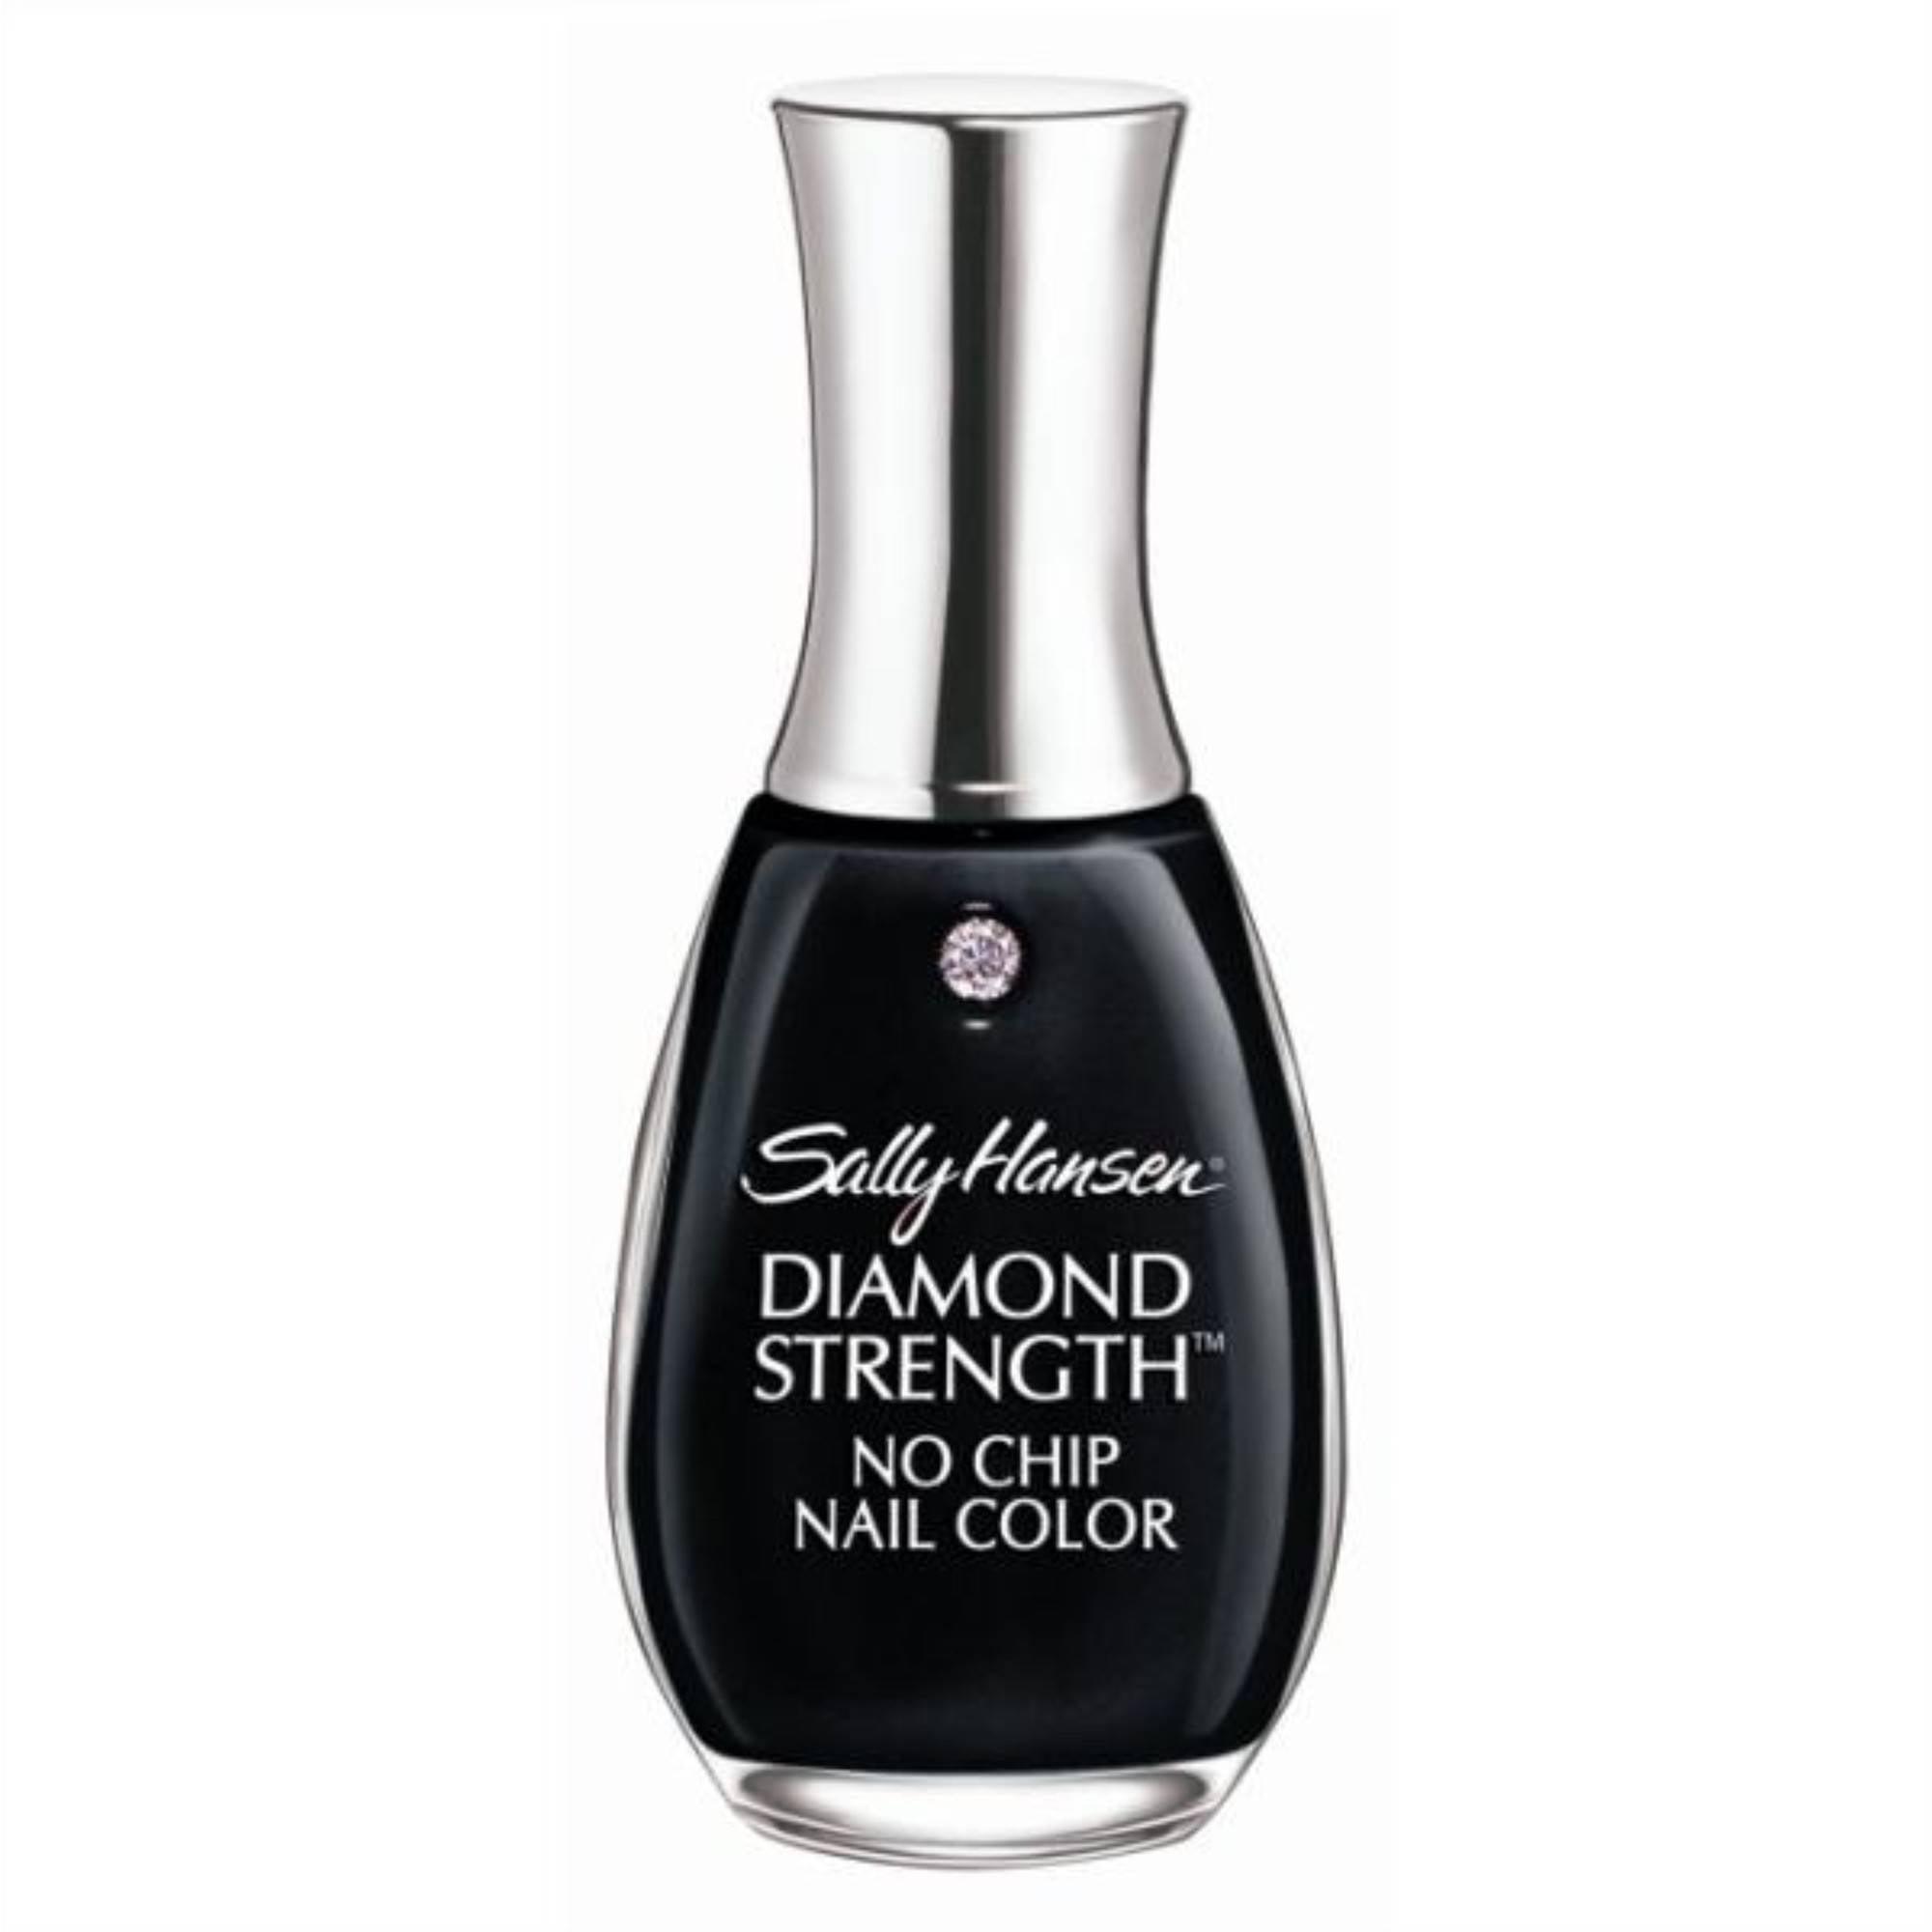 Sally Hansen Diamond Strength No Chip Nail Color - Walmart.com